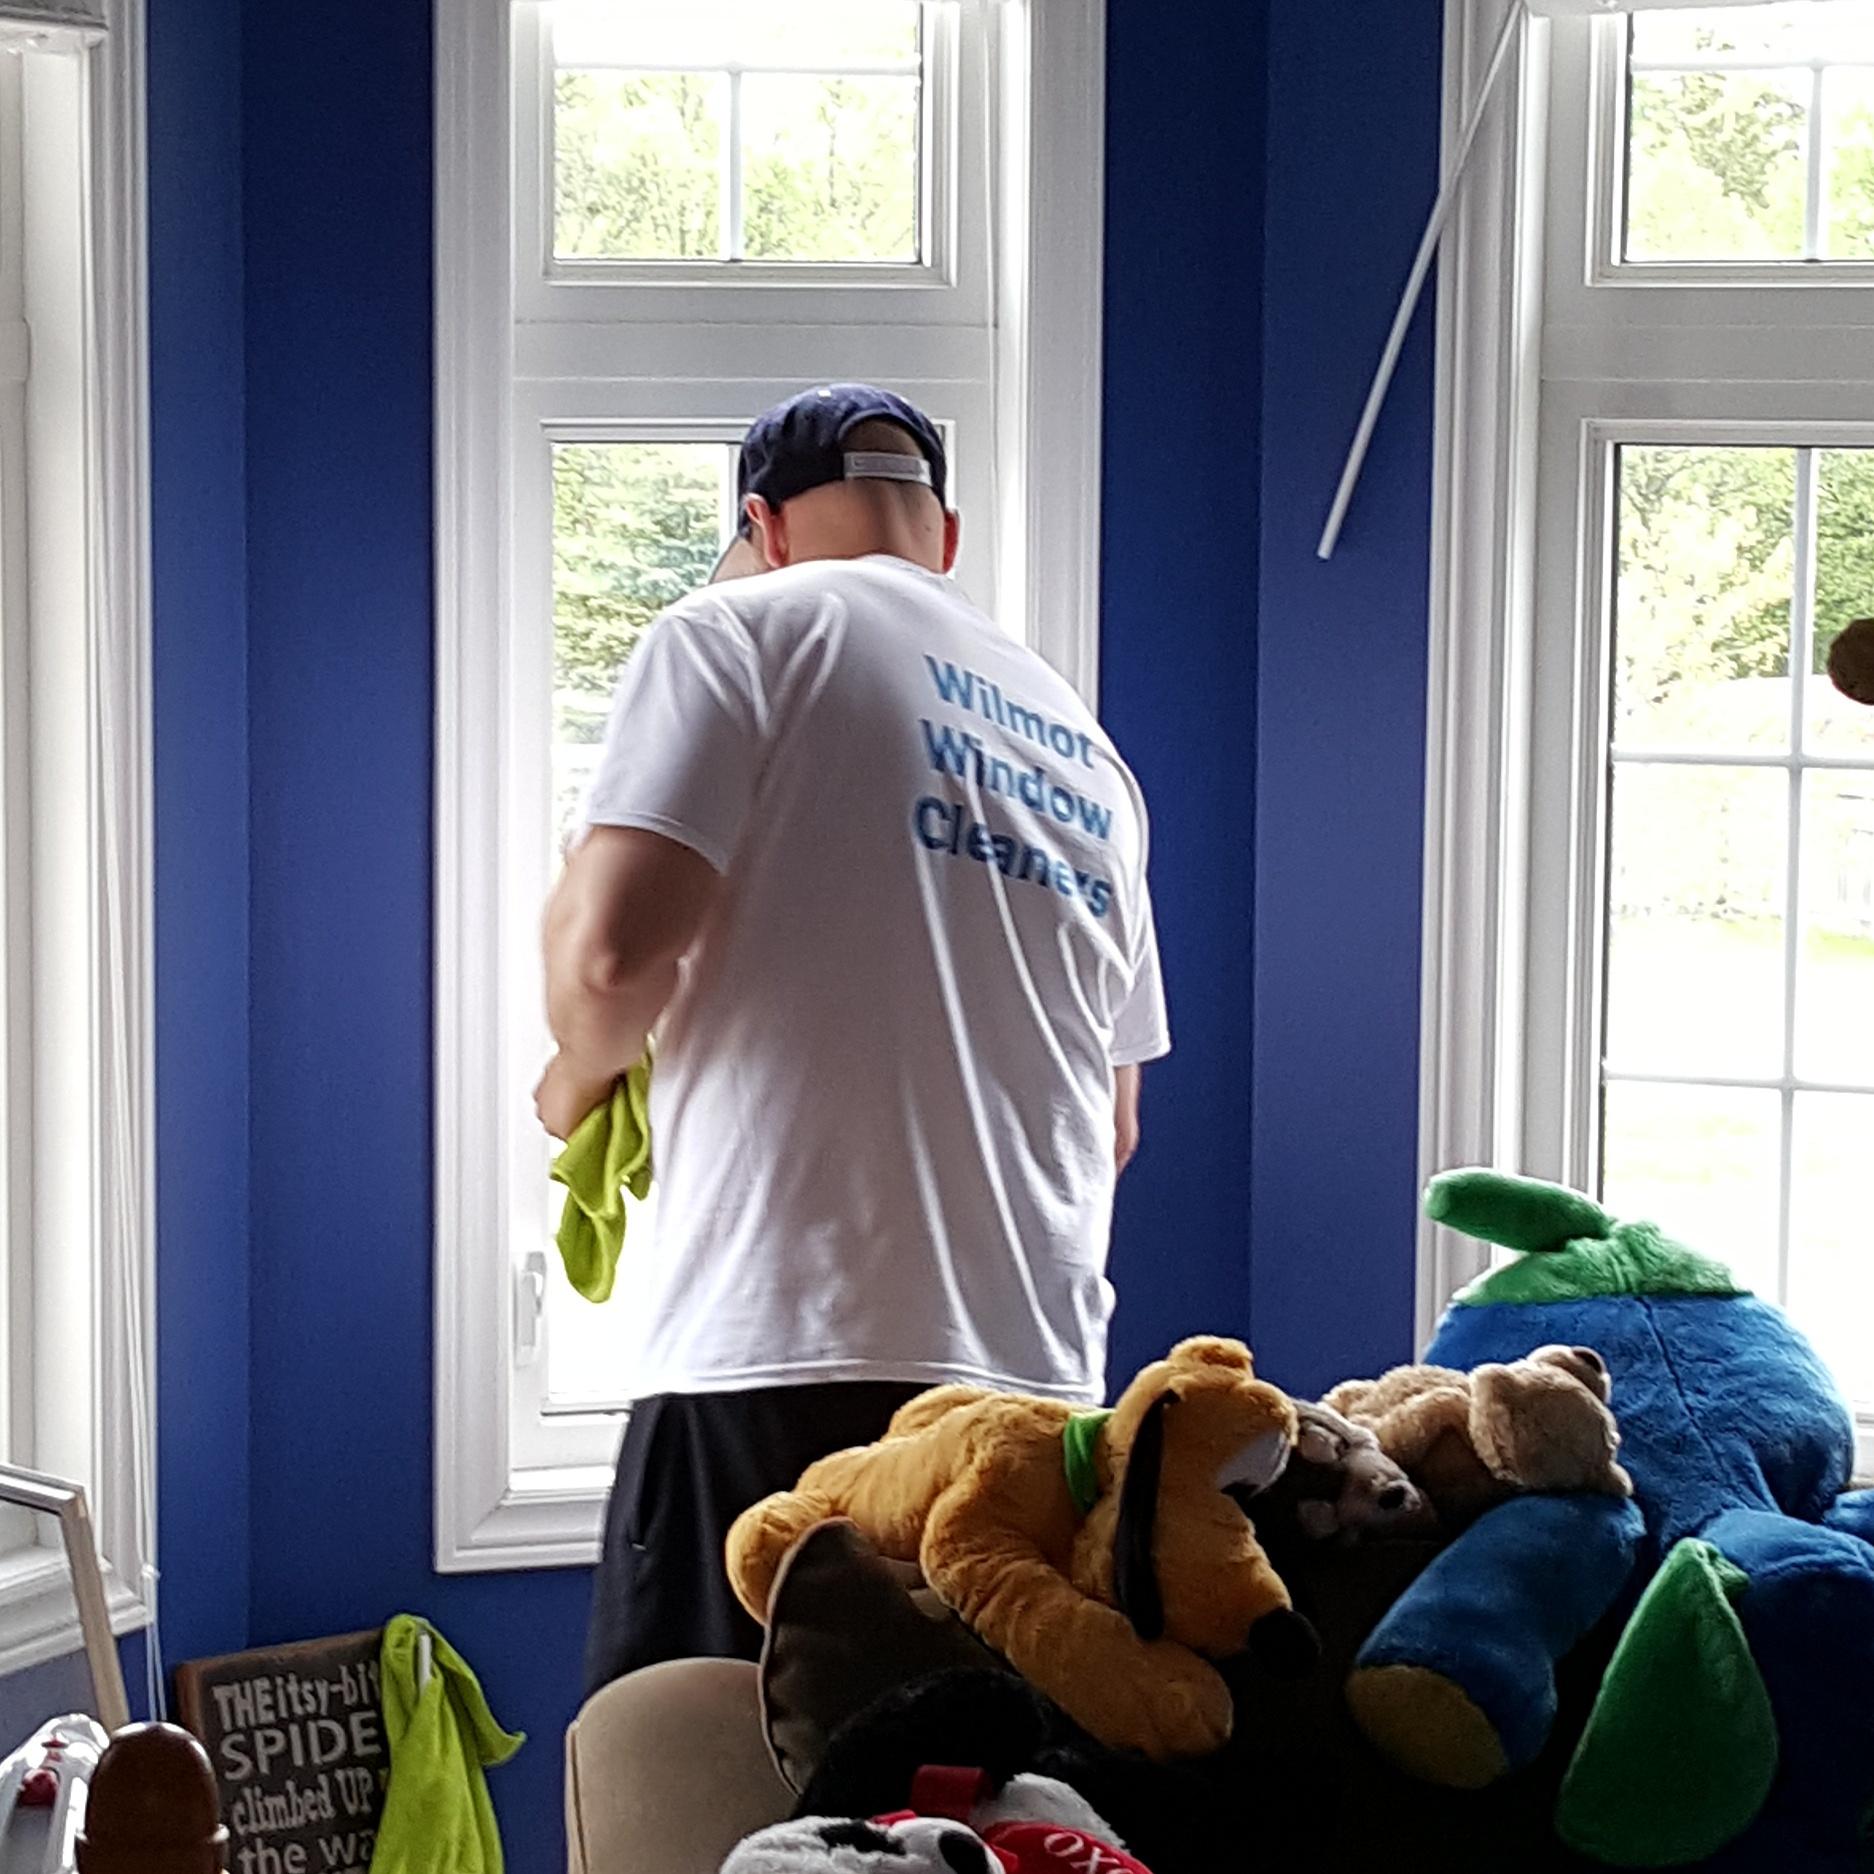 Wilmot Window Cleaners